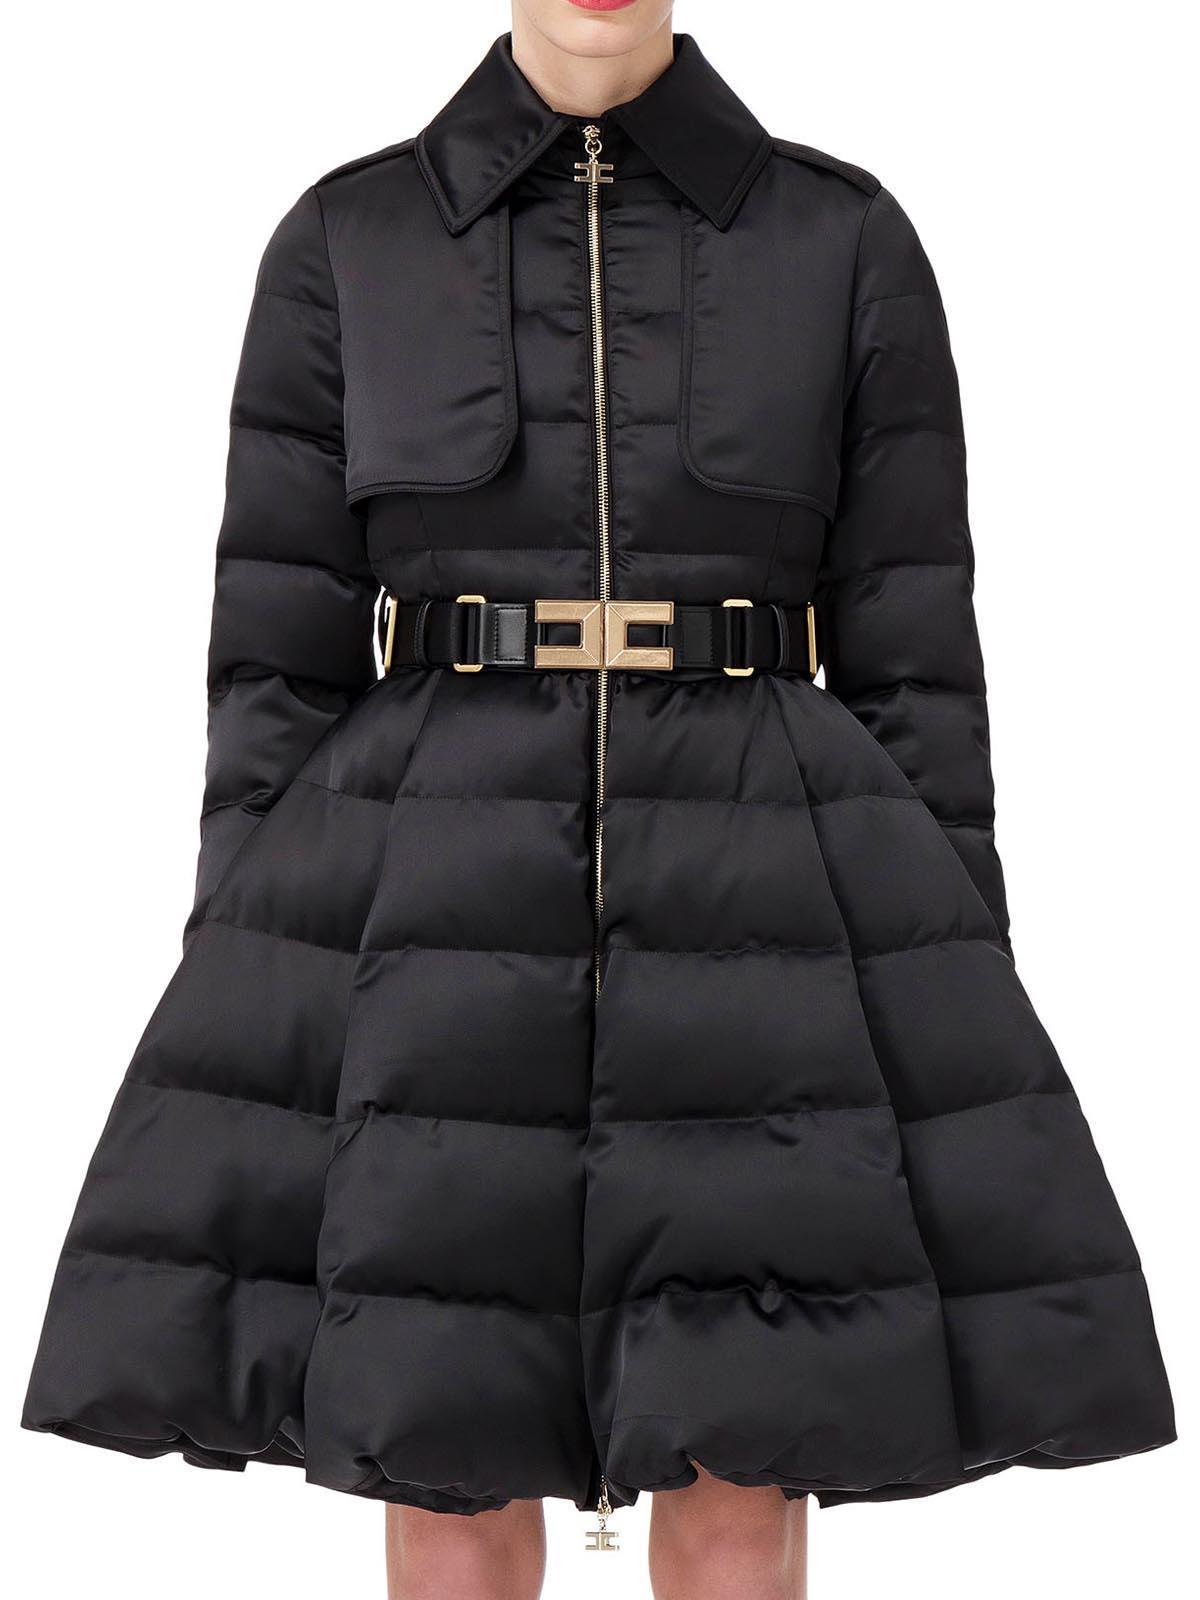 Quilted With Coat Belt W6cx60uqr Pi16z86e2 Franchi Elisabetta wvS466